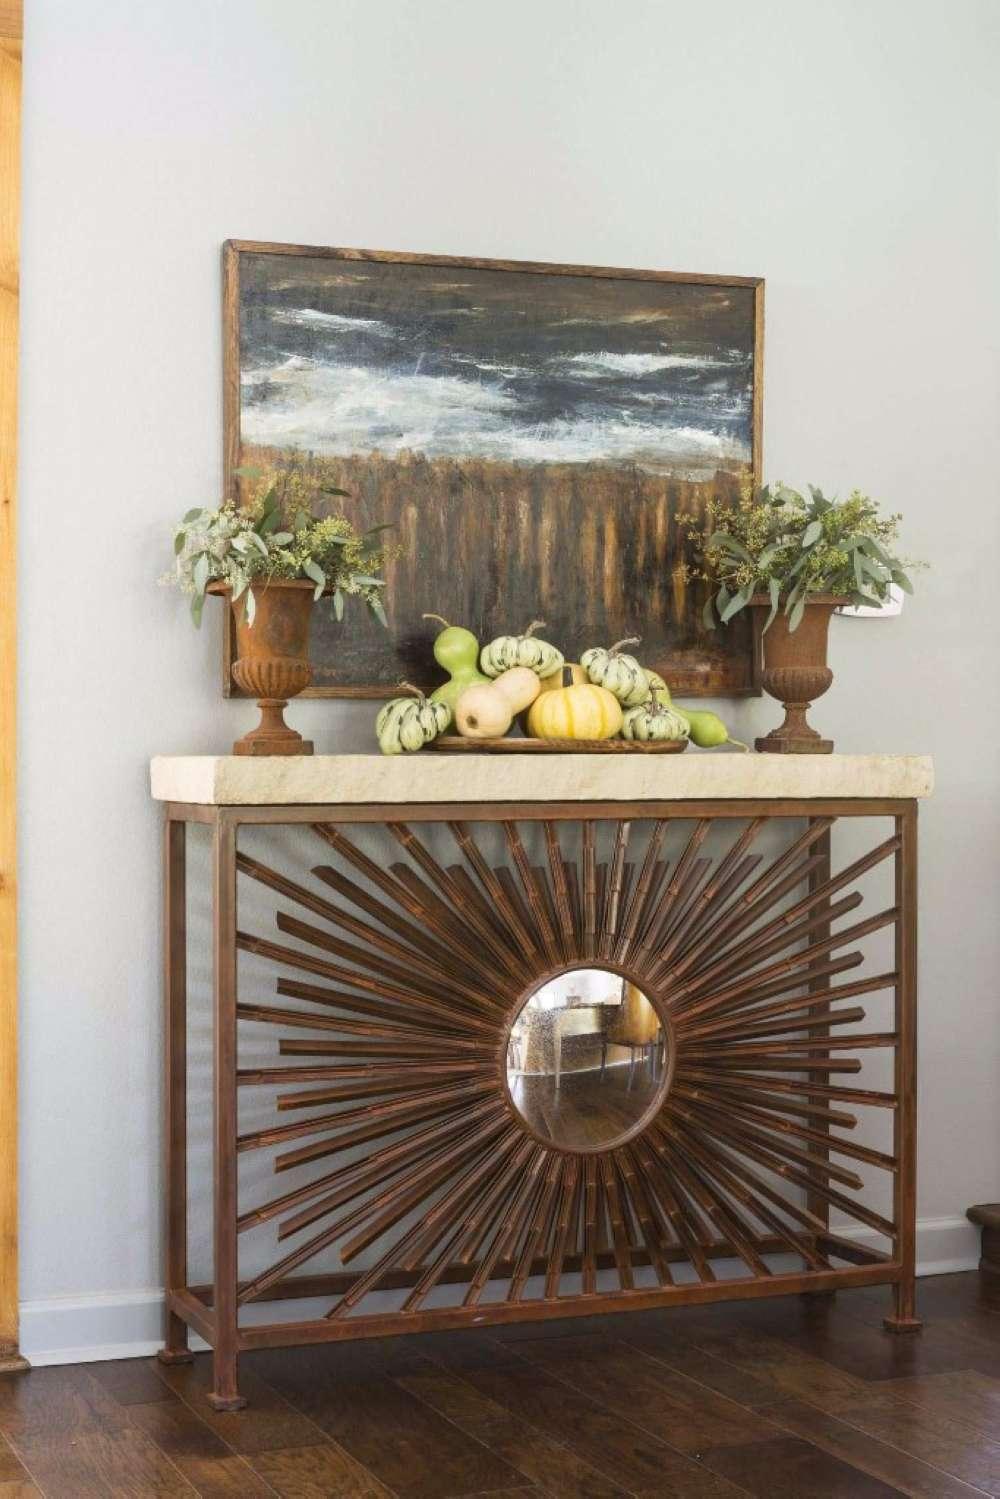 Arkansas-interior-design-Southern-Comfort-k-lewis-interior-design-IMG_007